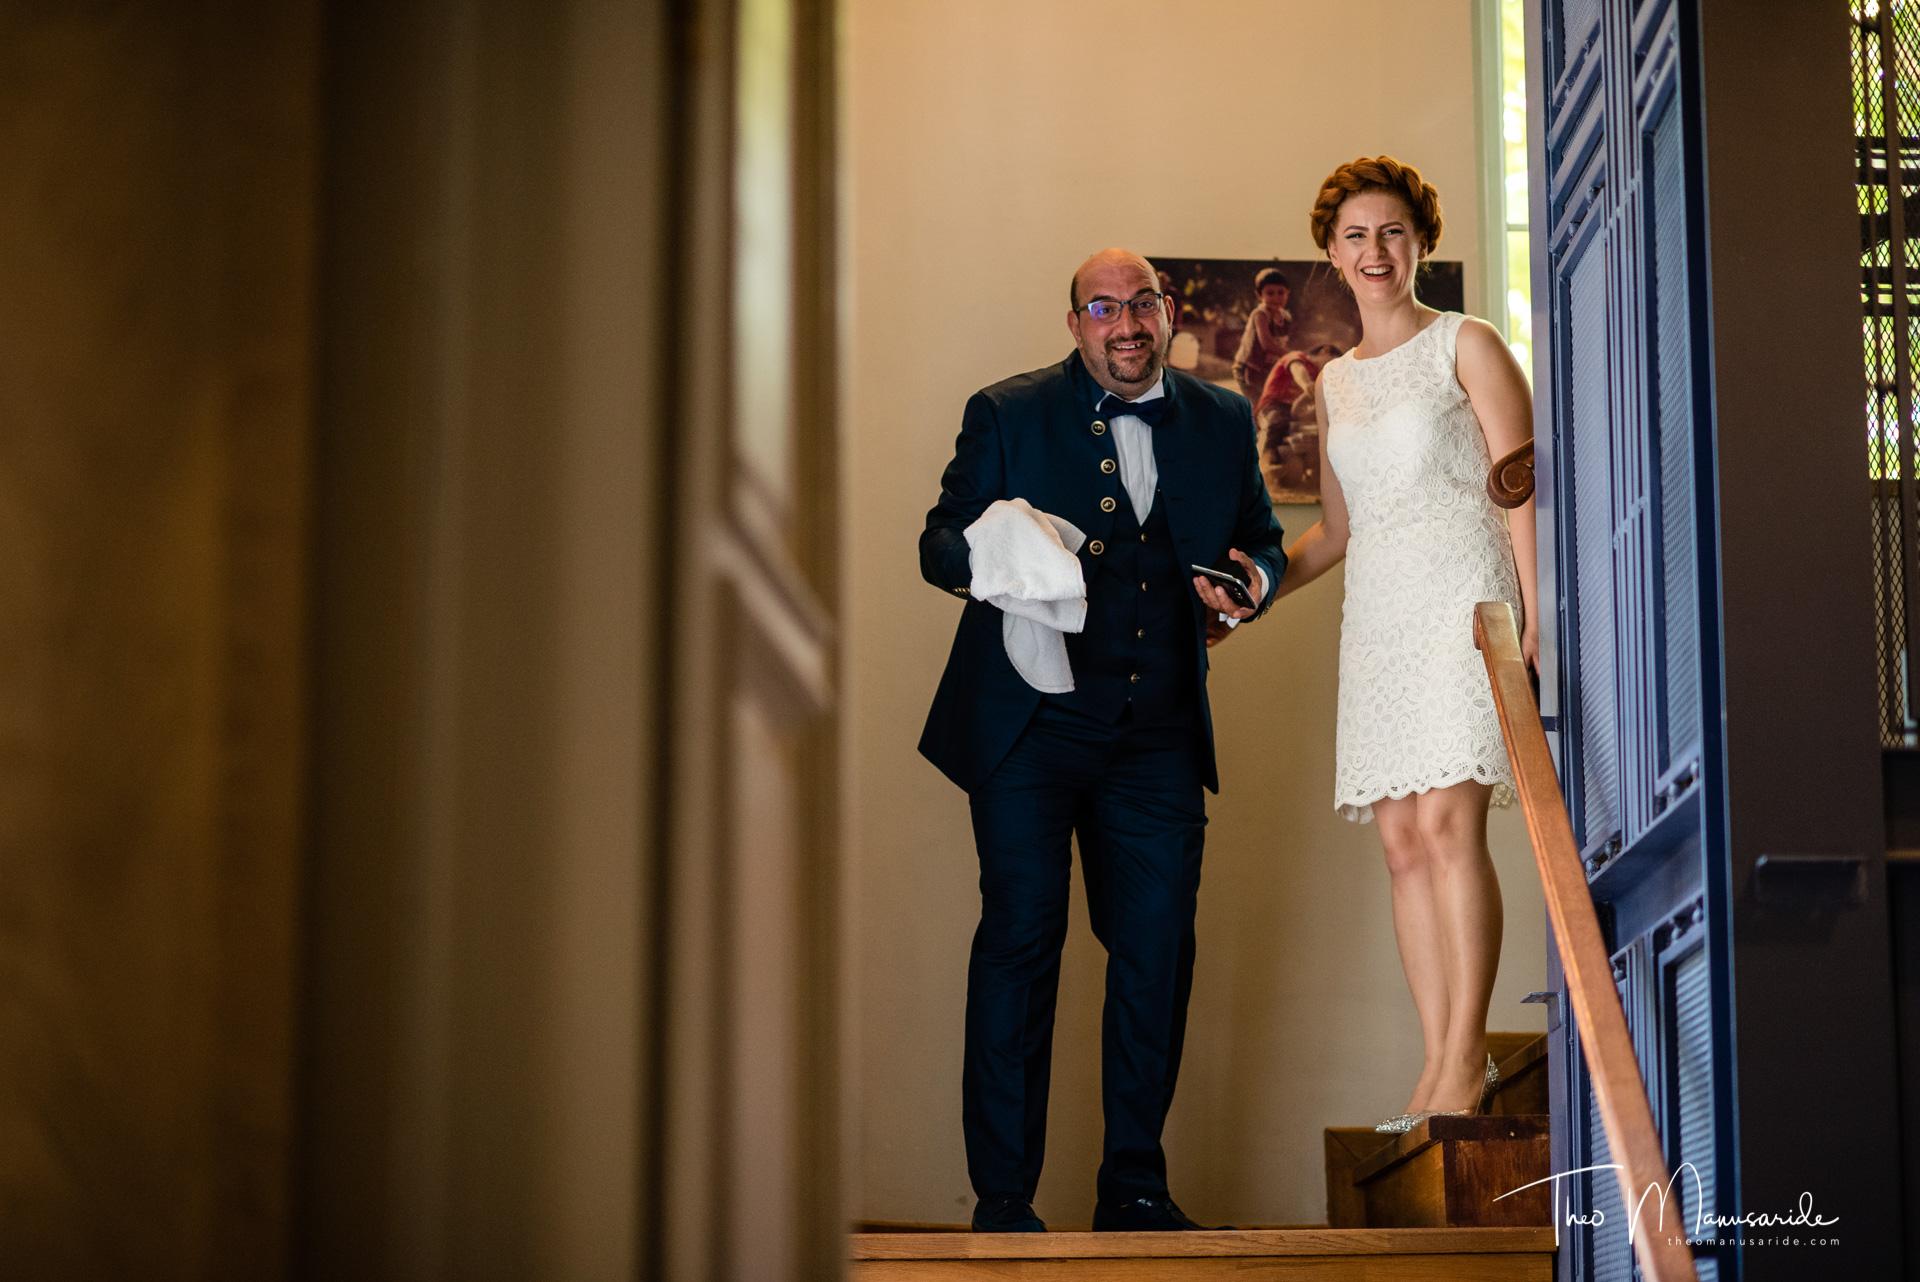 fotograf-nunta-domeniul-manasia-9